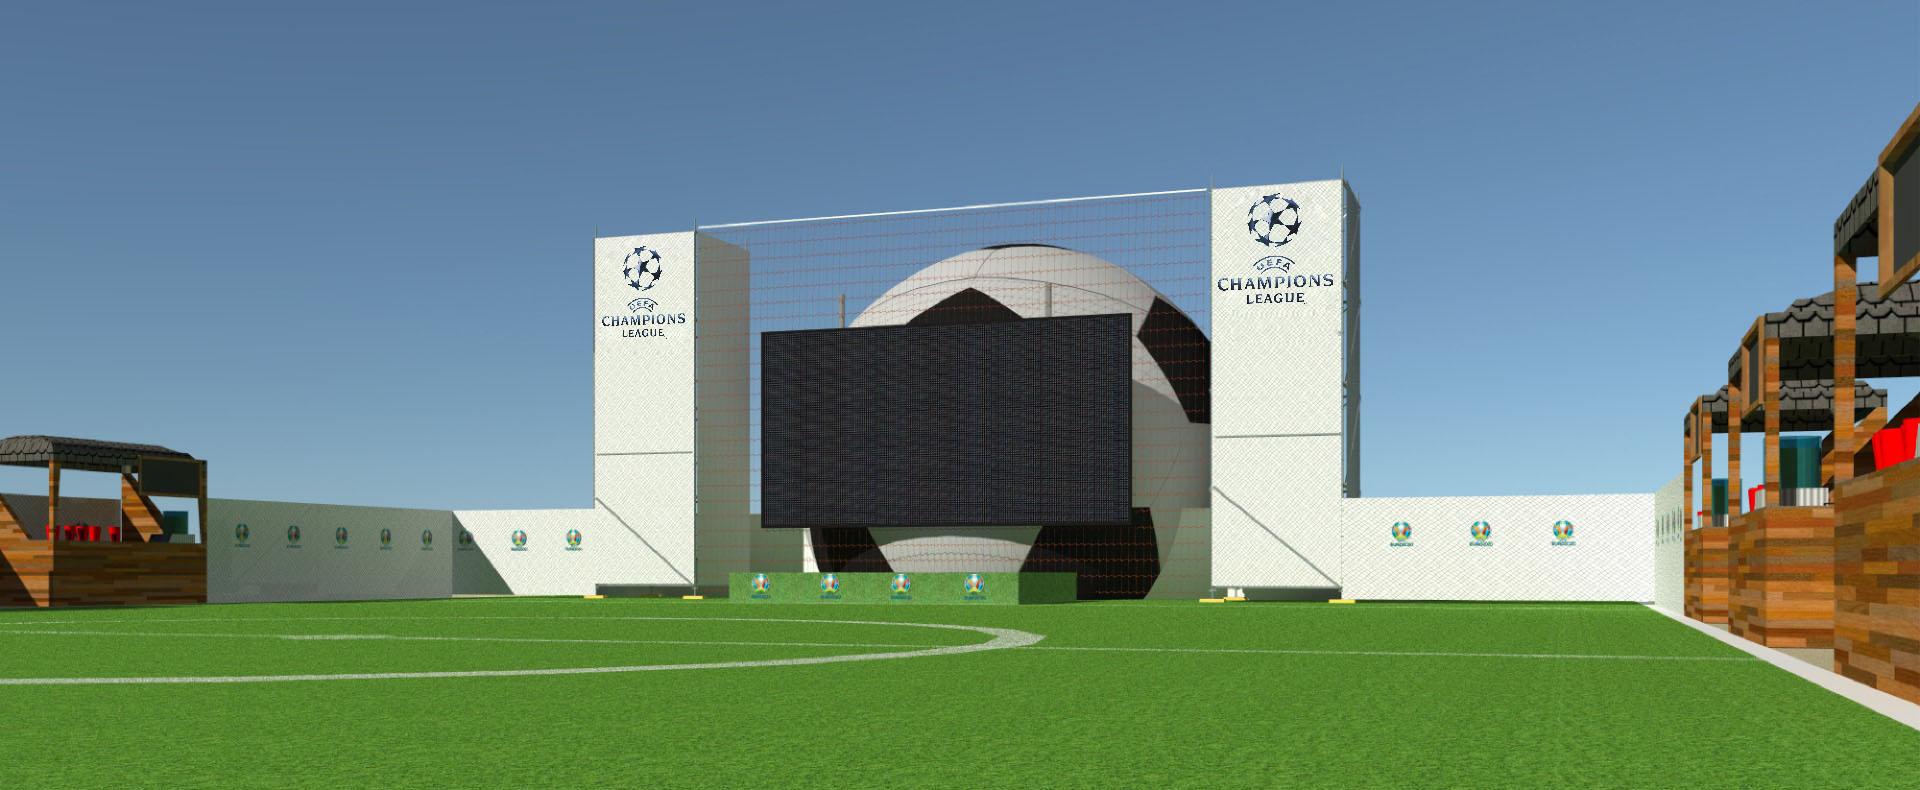 Fun Zone UEFA Champions League